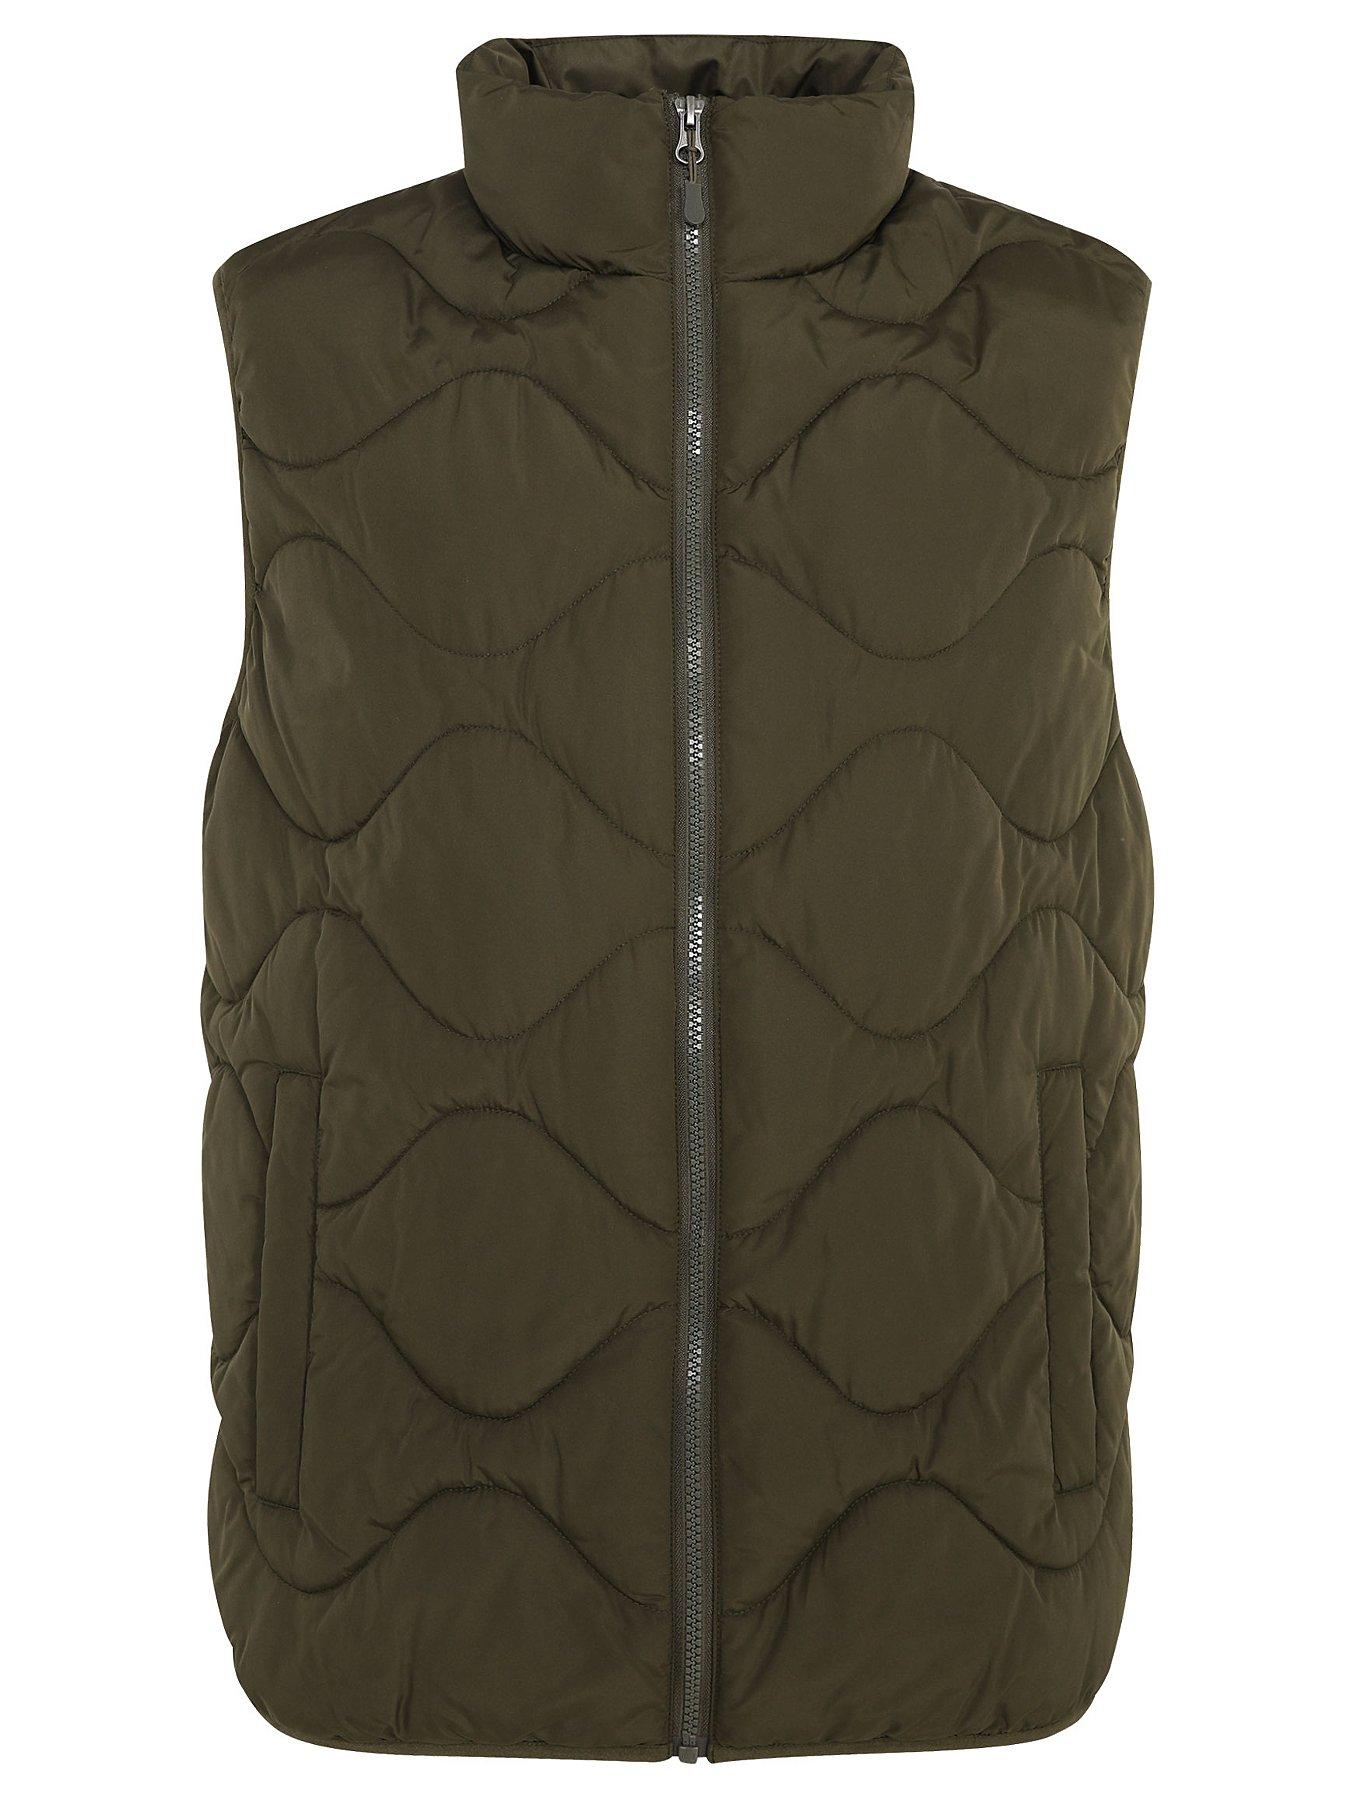 Khaki Padded Gilet in Medium, Large - £5 @ George Asda Free C&C